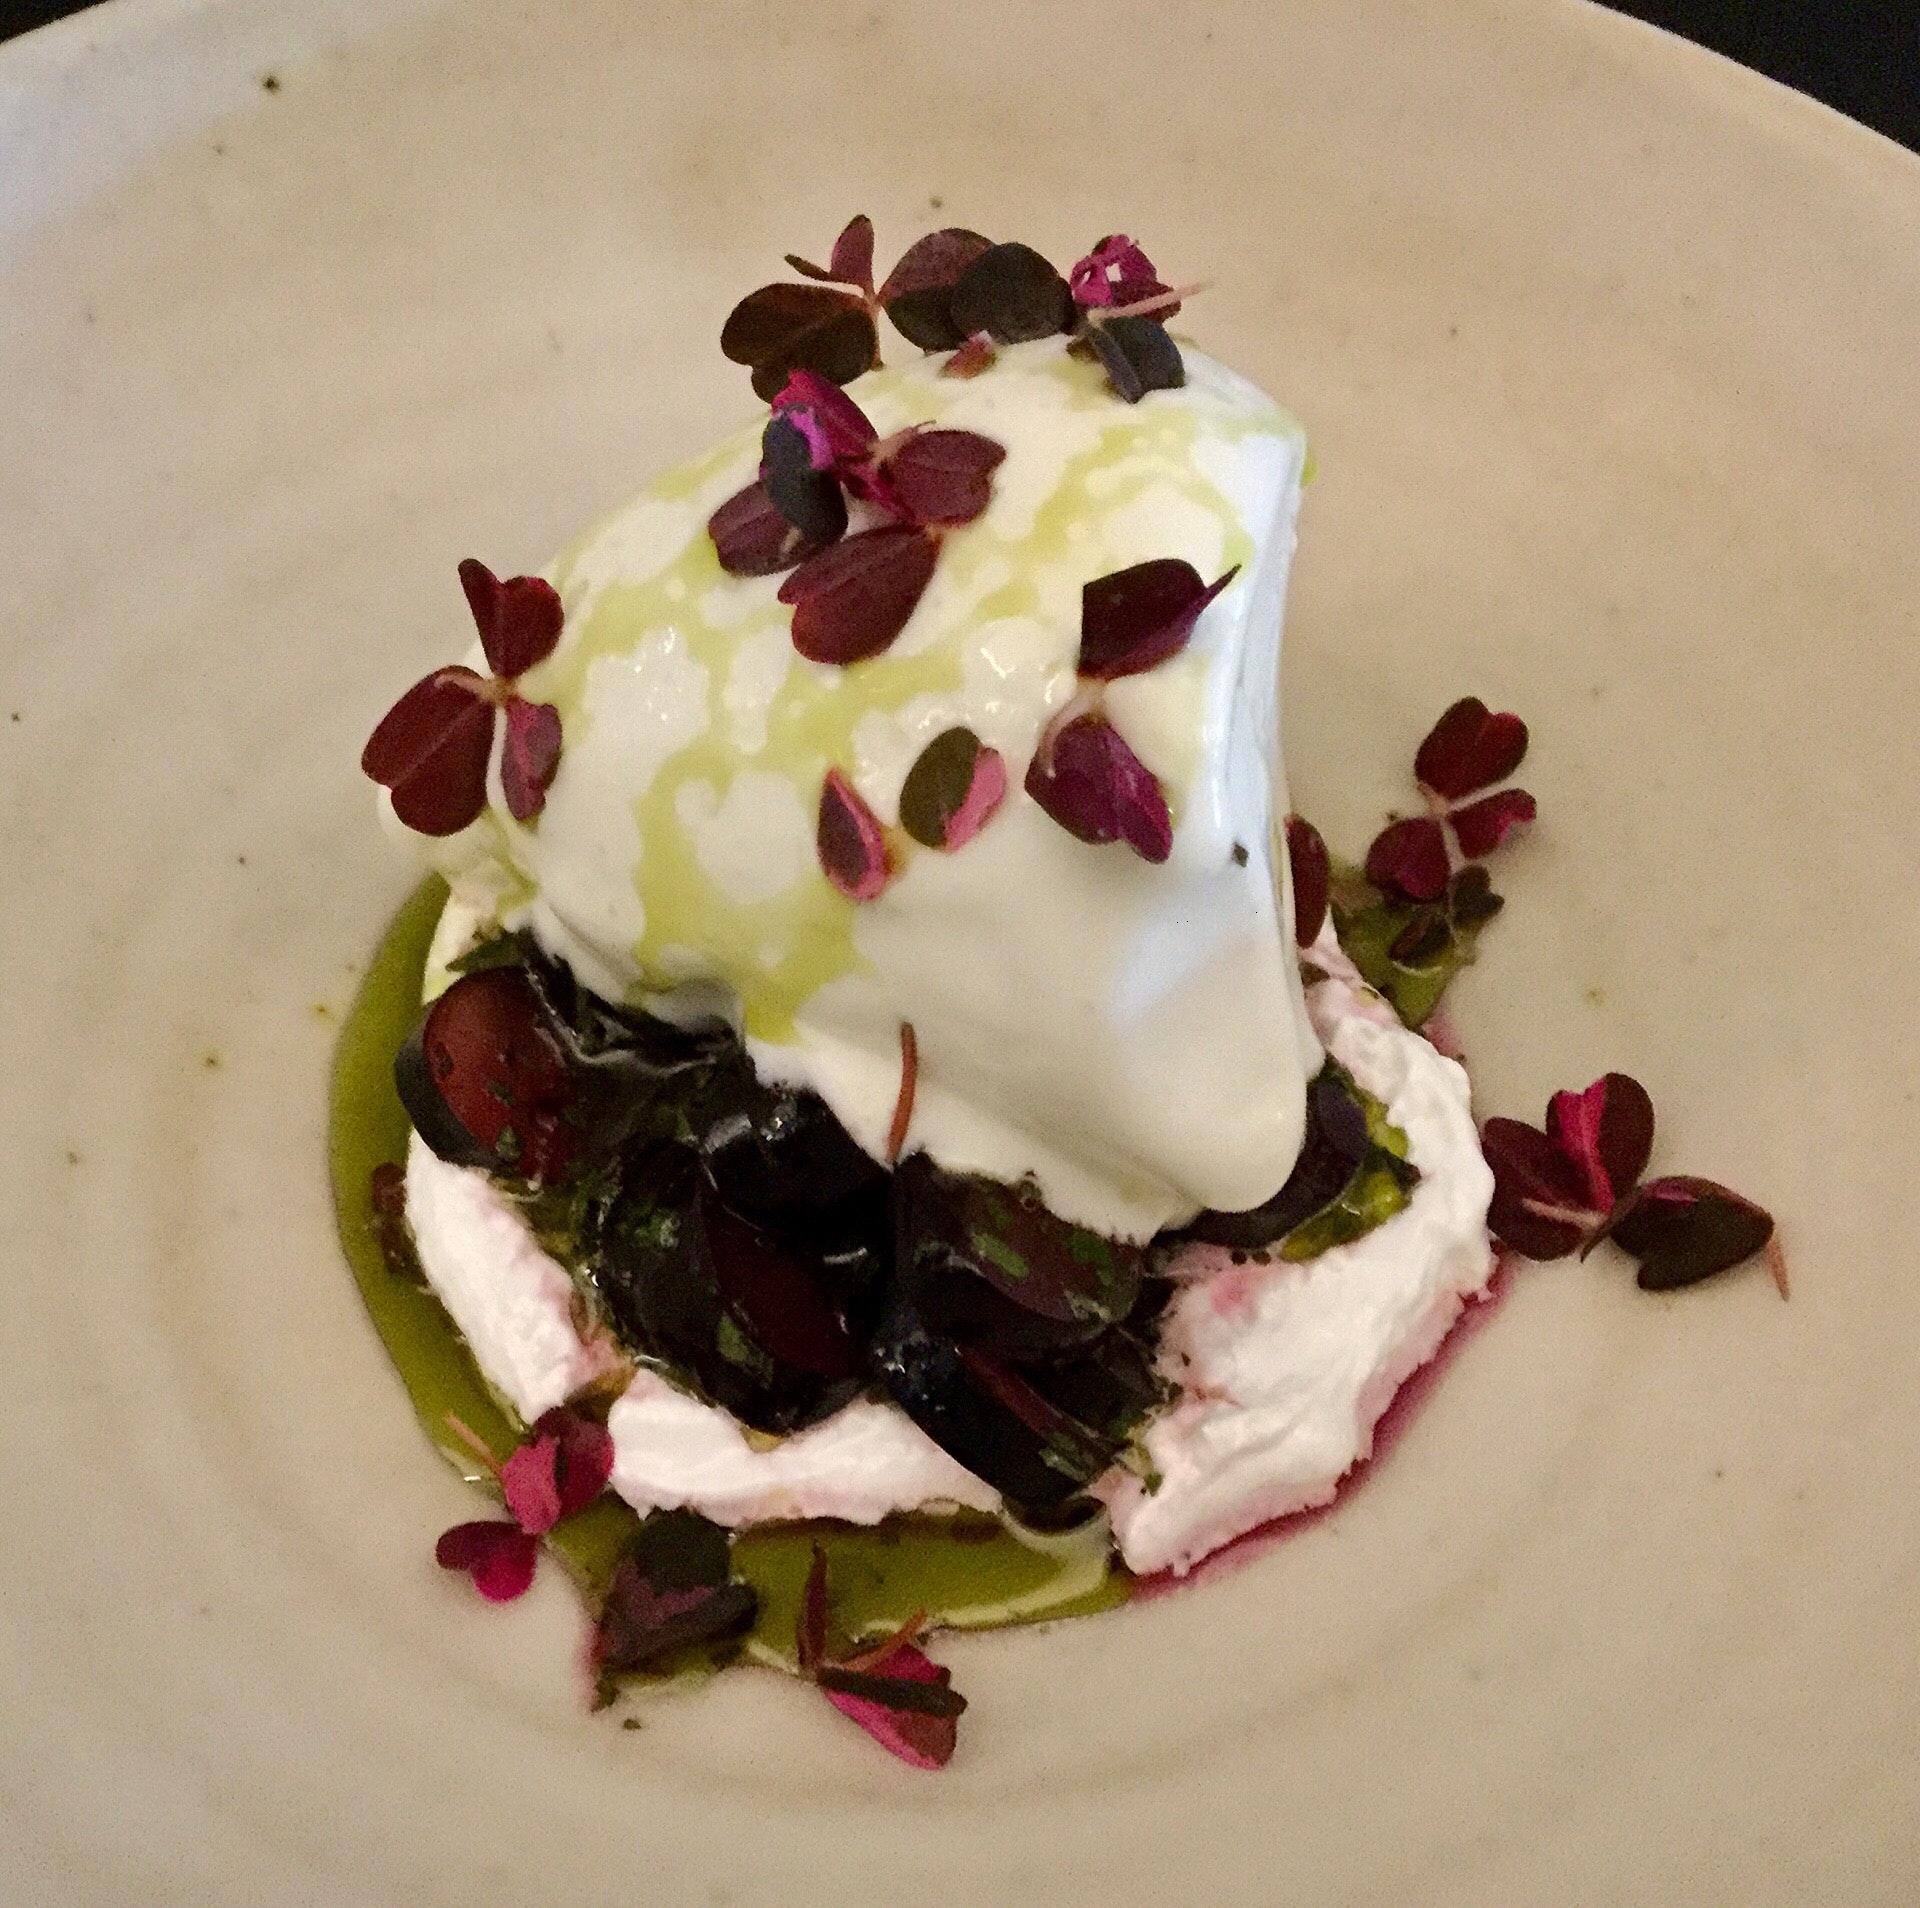 Yoghurt sorbet, shiso, oxalis, black grapes, roasted kelp oil  $16